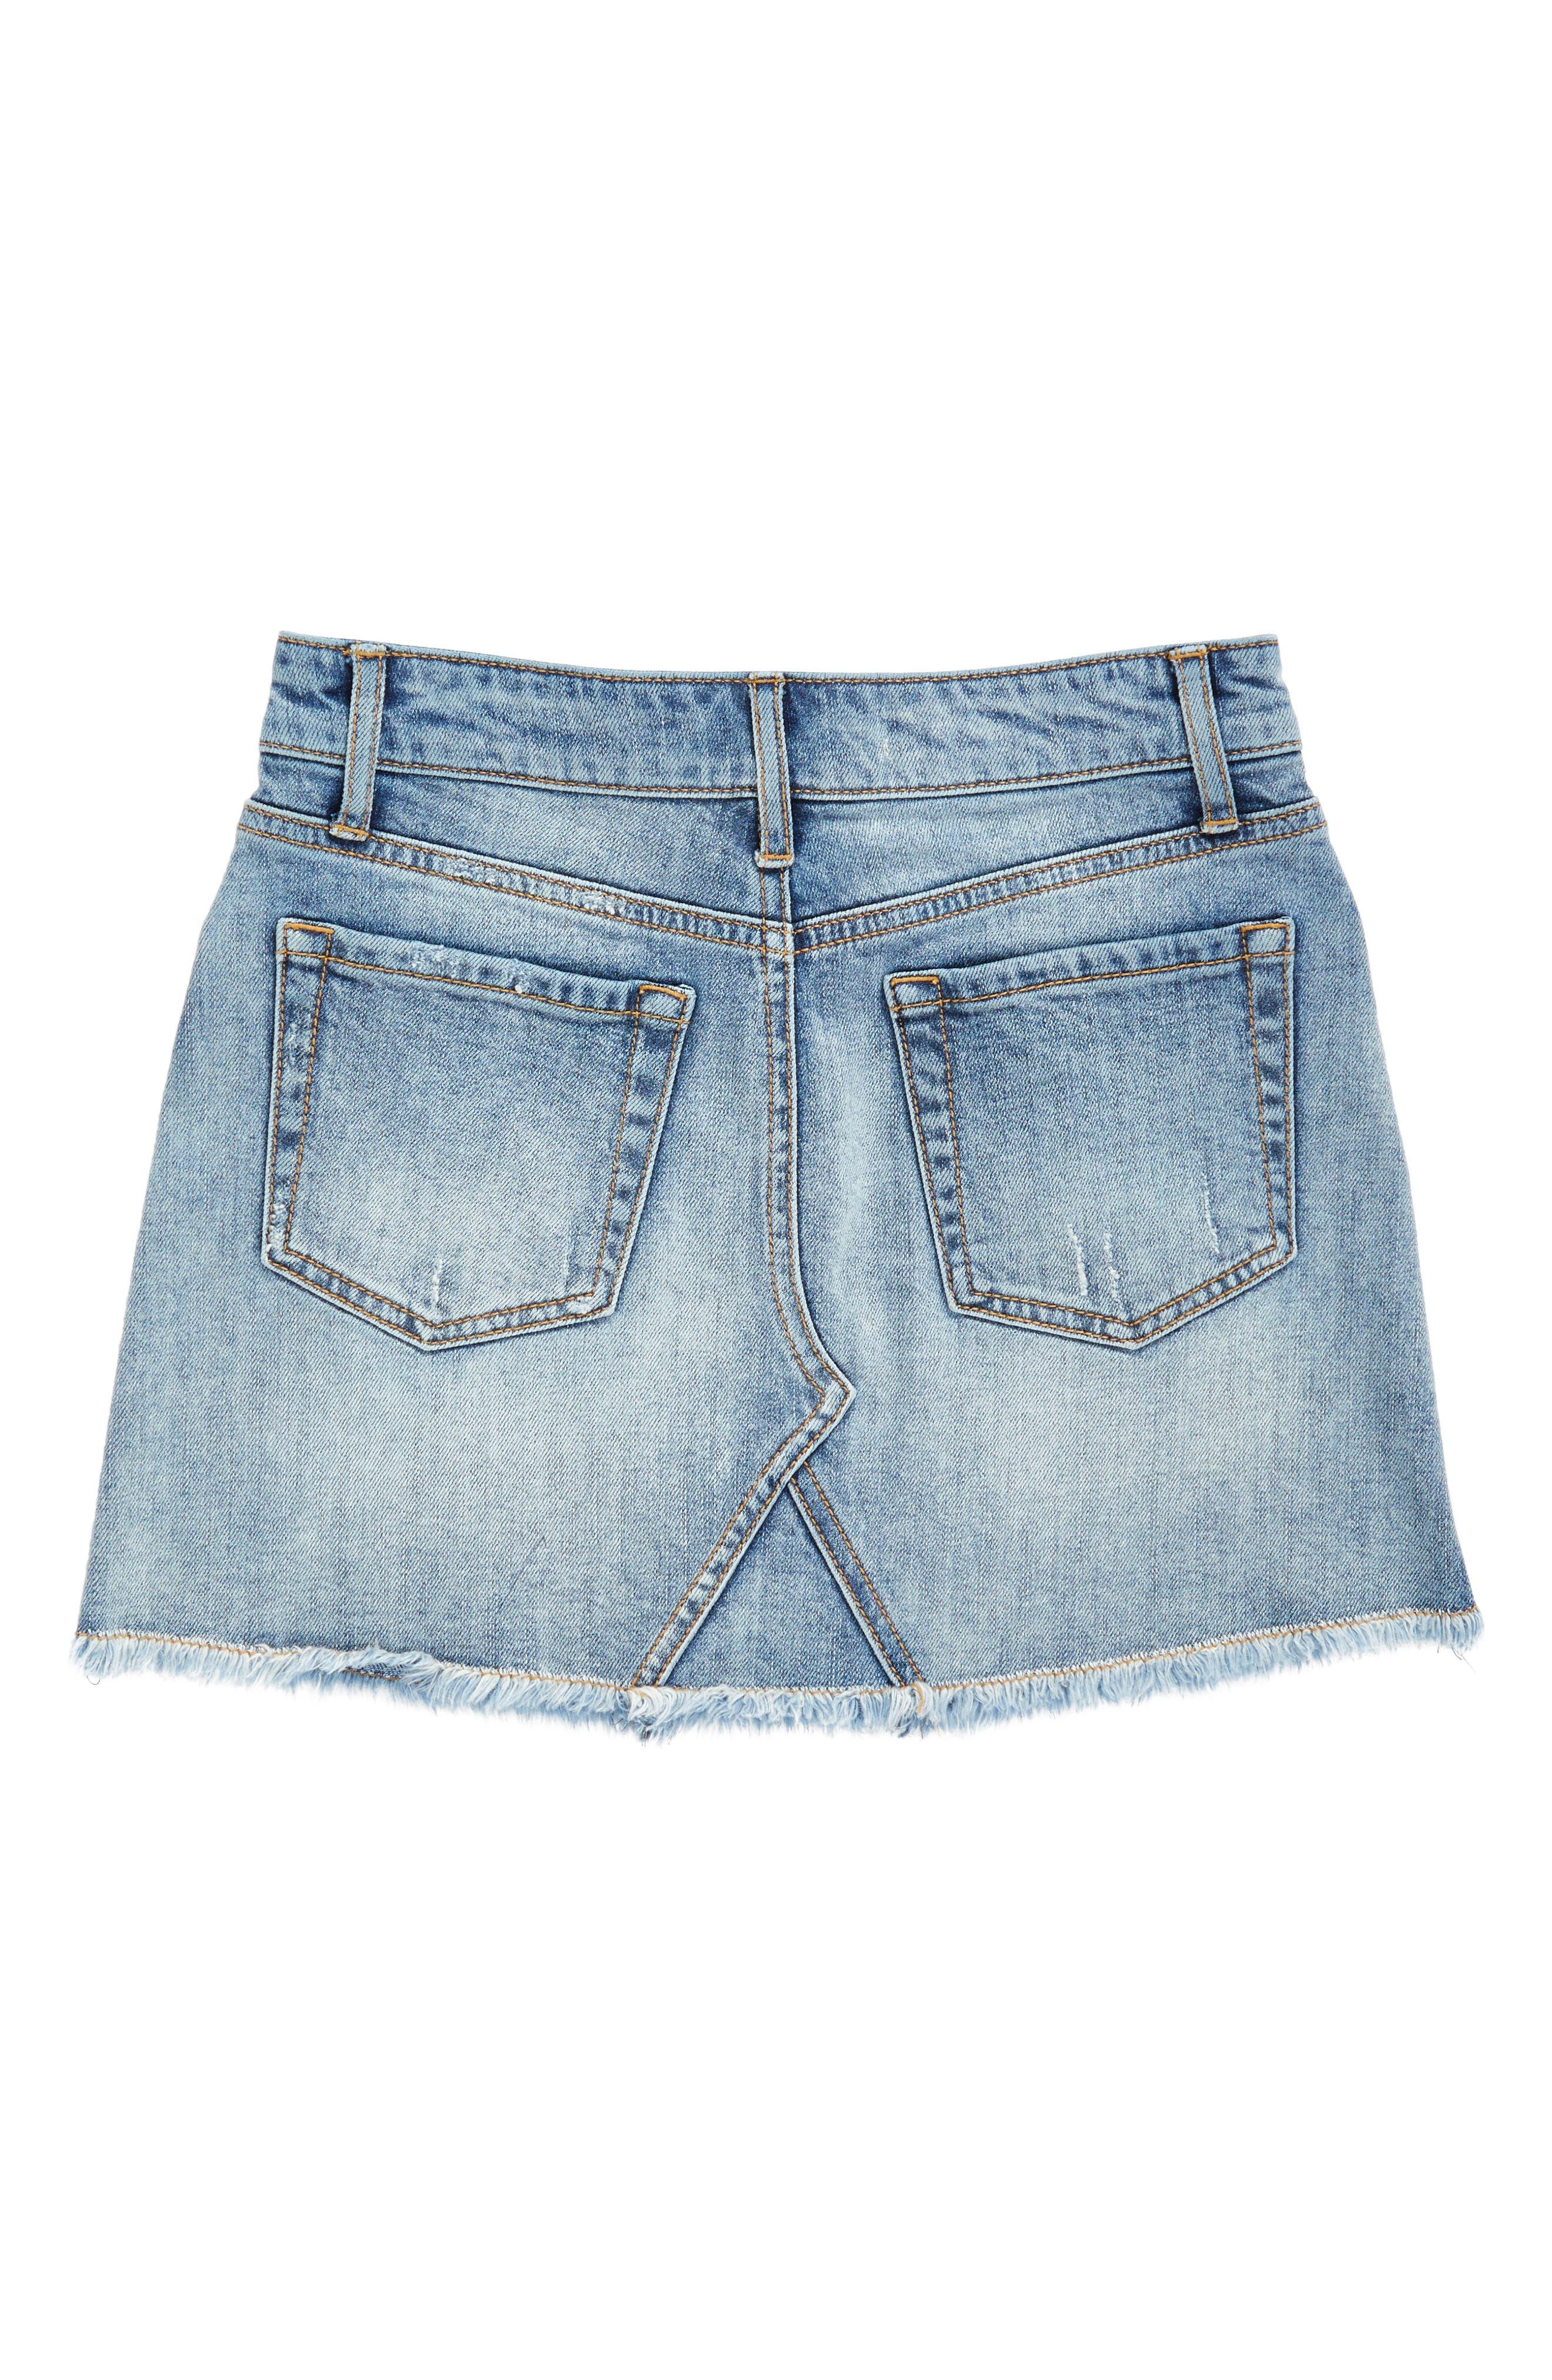 Alternate Image 2  - Treasure & Bond Cutoff Denim Skirt (Big Girls)